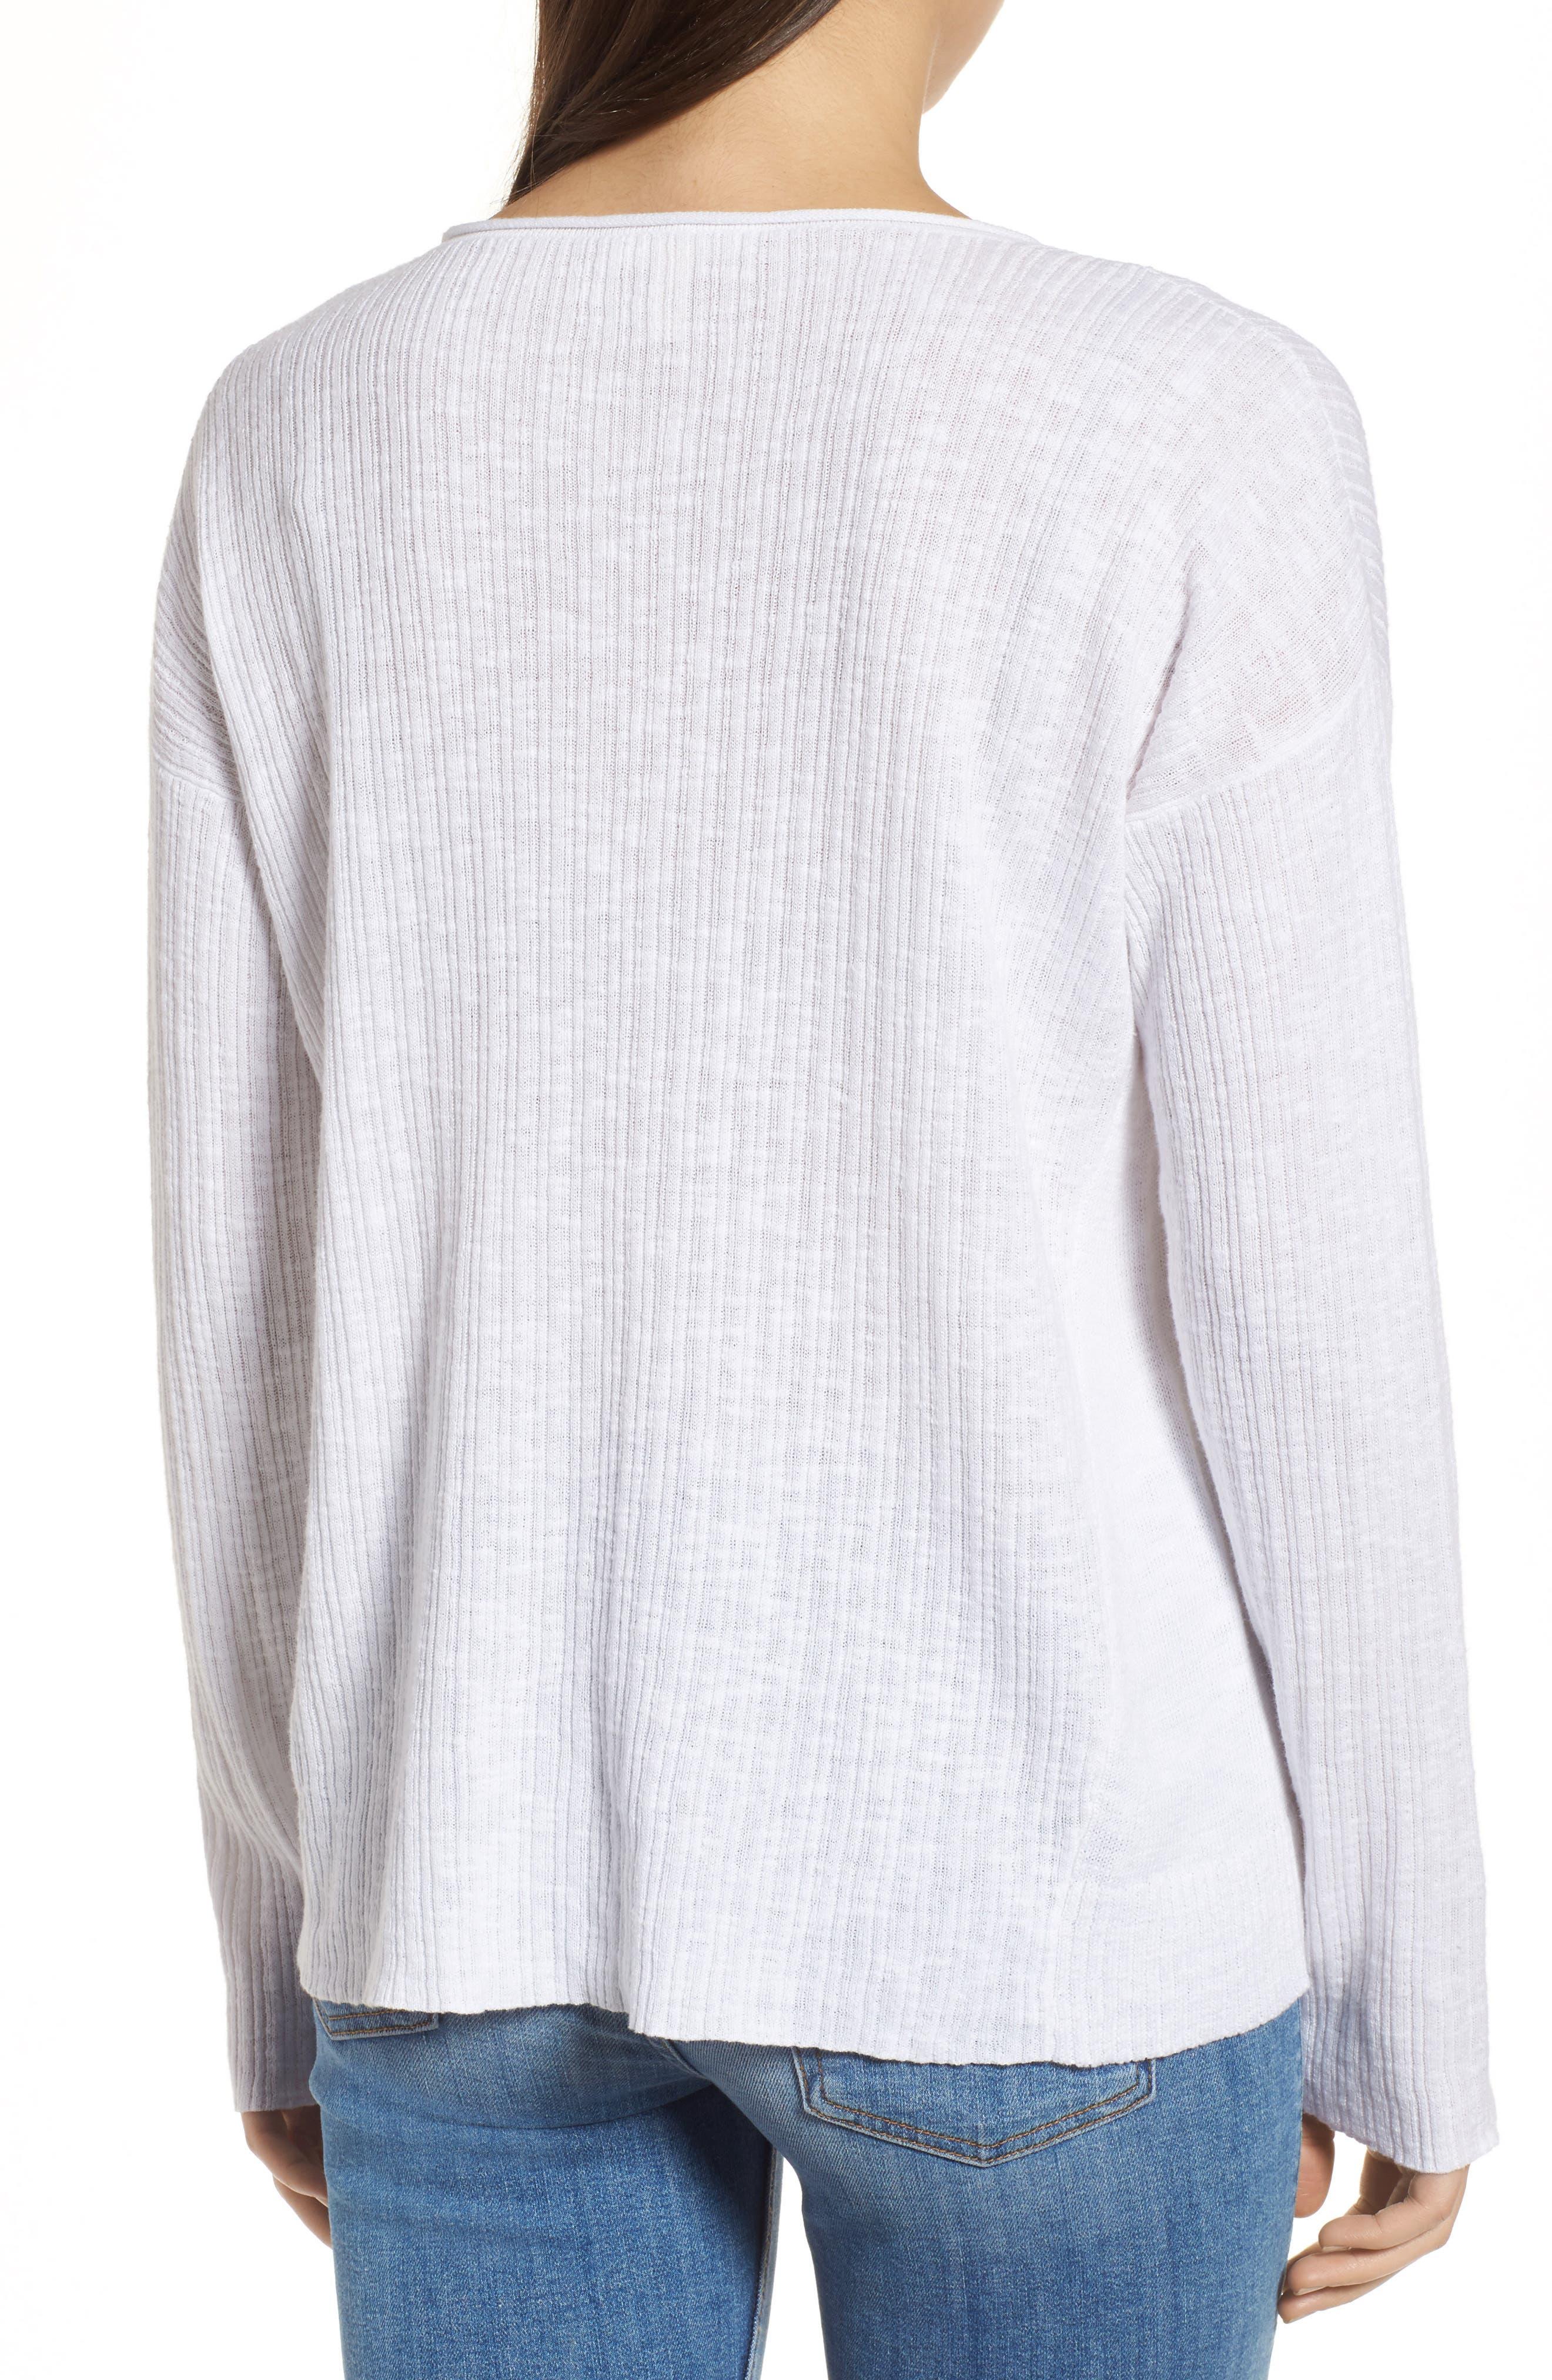 Organic Linen & Cotton Crewneck Sweater,                             Alternate thumbnail 6, color,